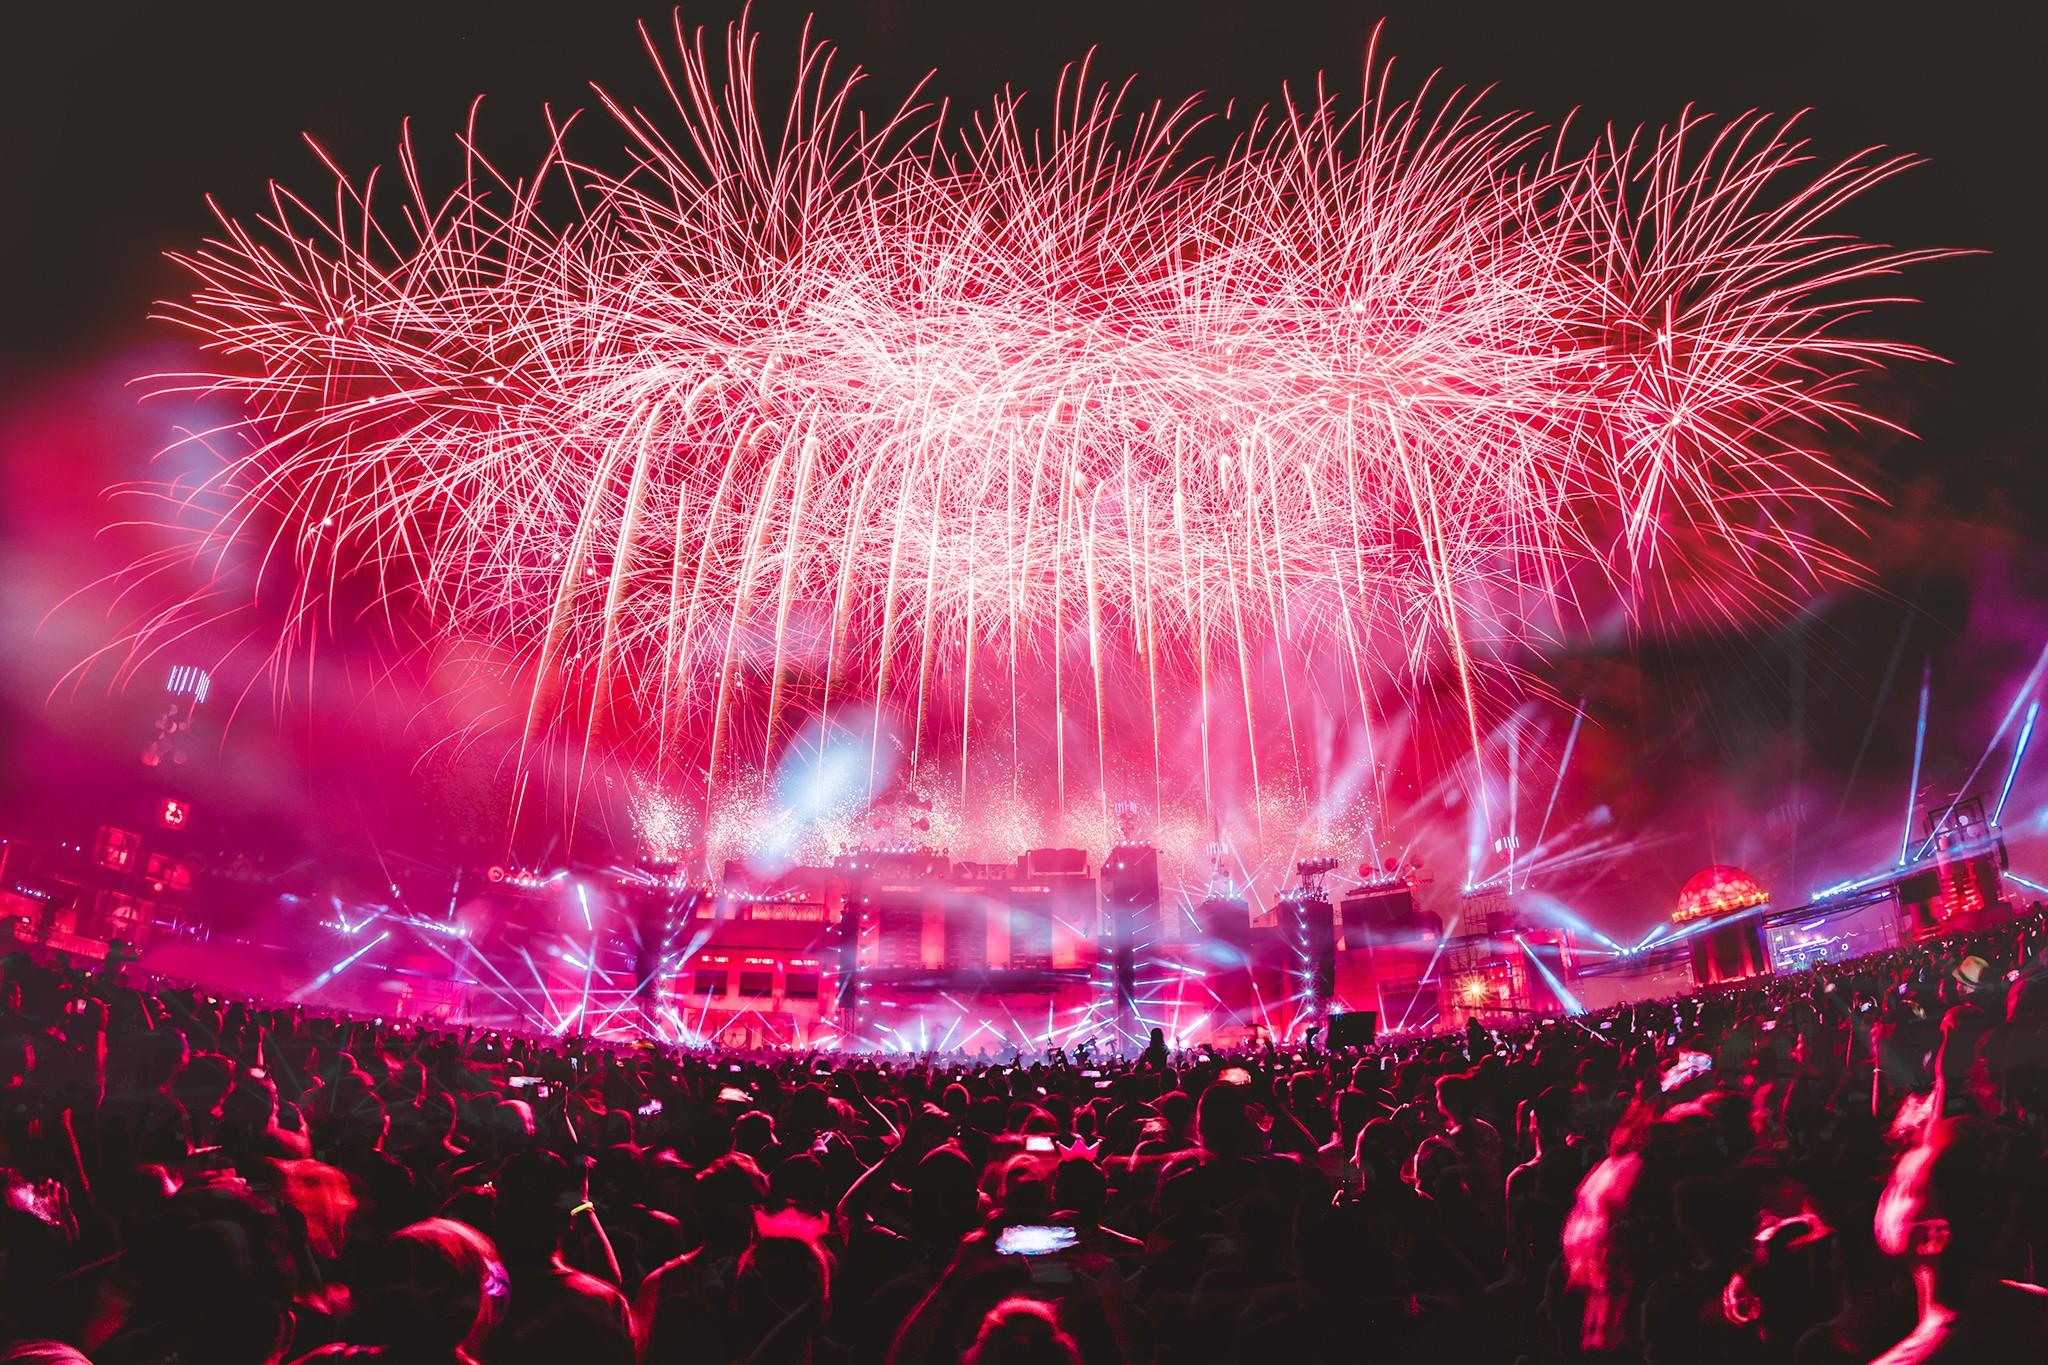 PV18 mainstage fireworks night ©Julian Huke - Dein Festival-Sommer + Verlosungen!